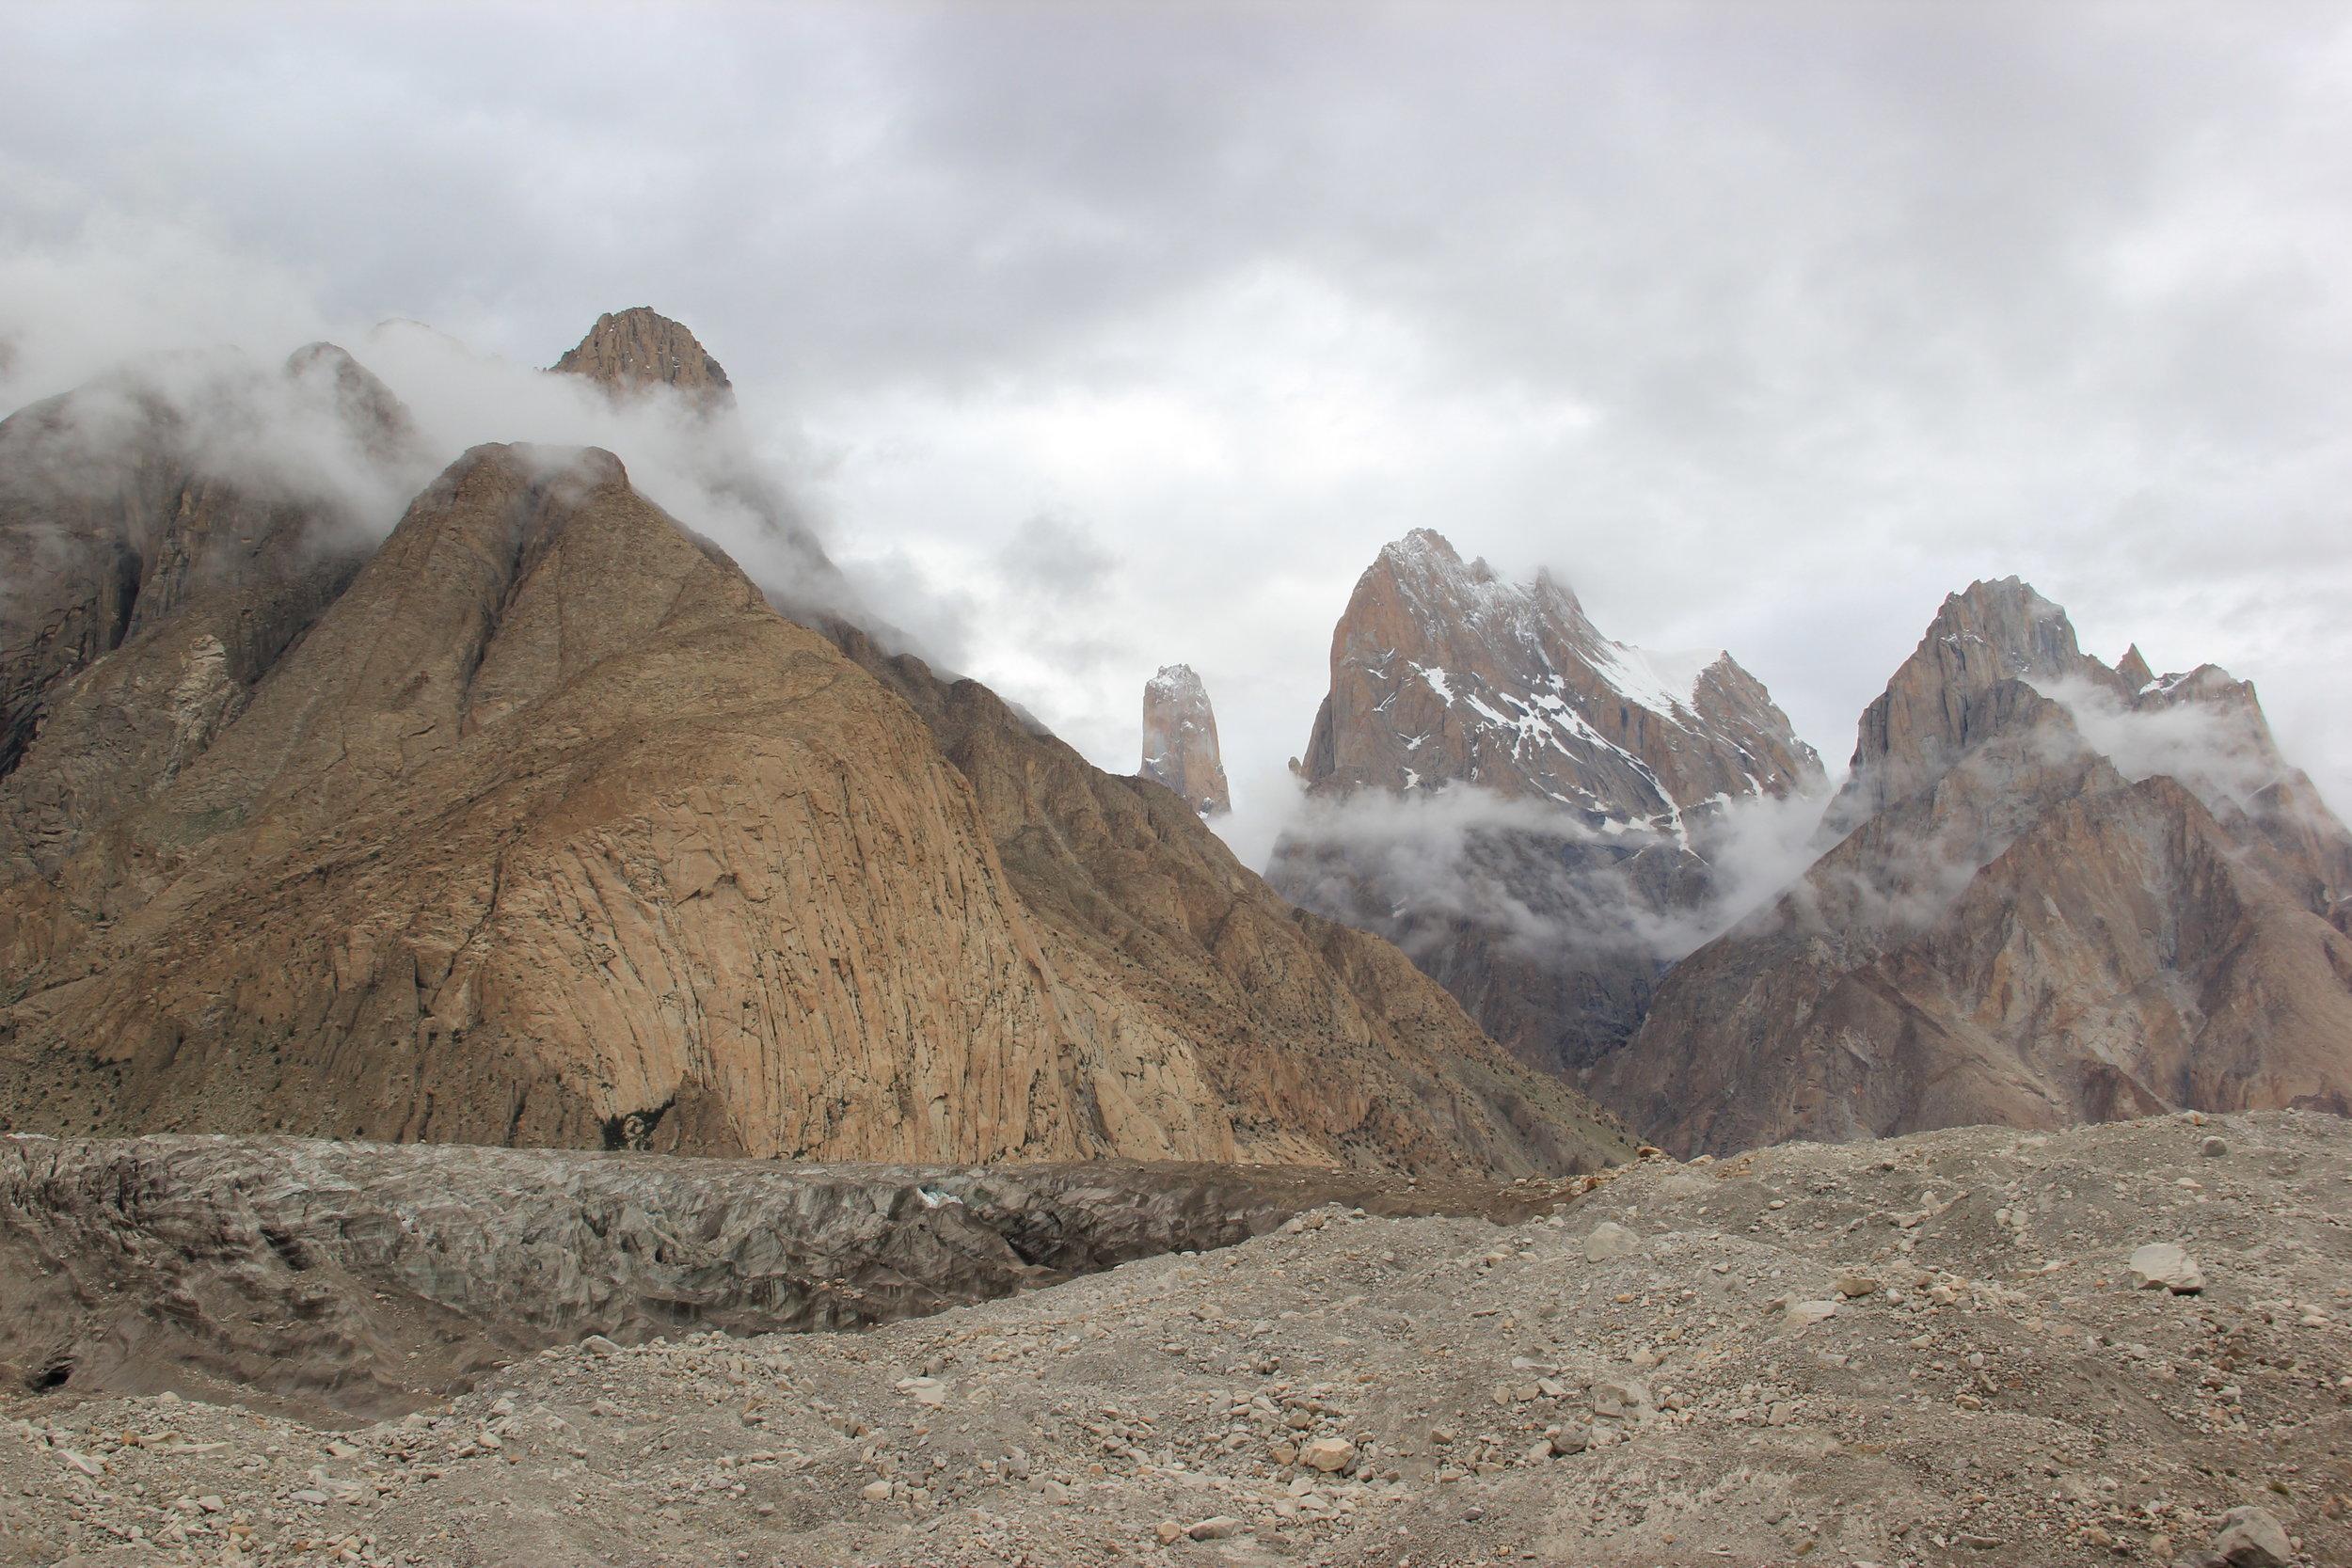 the Trango towers